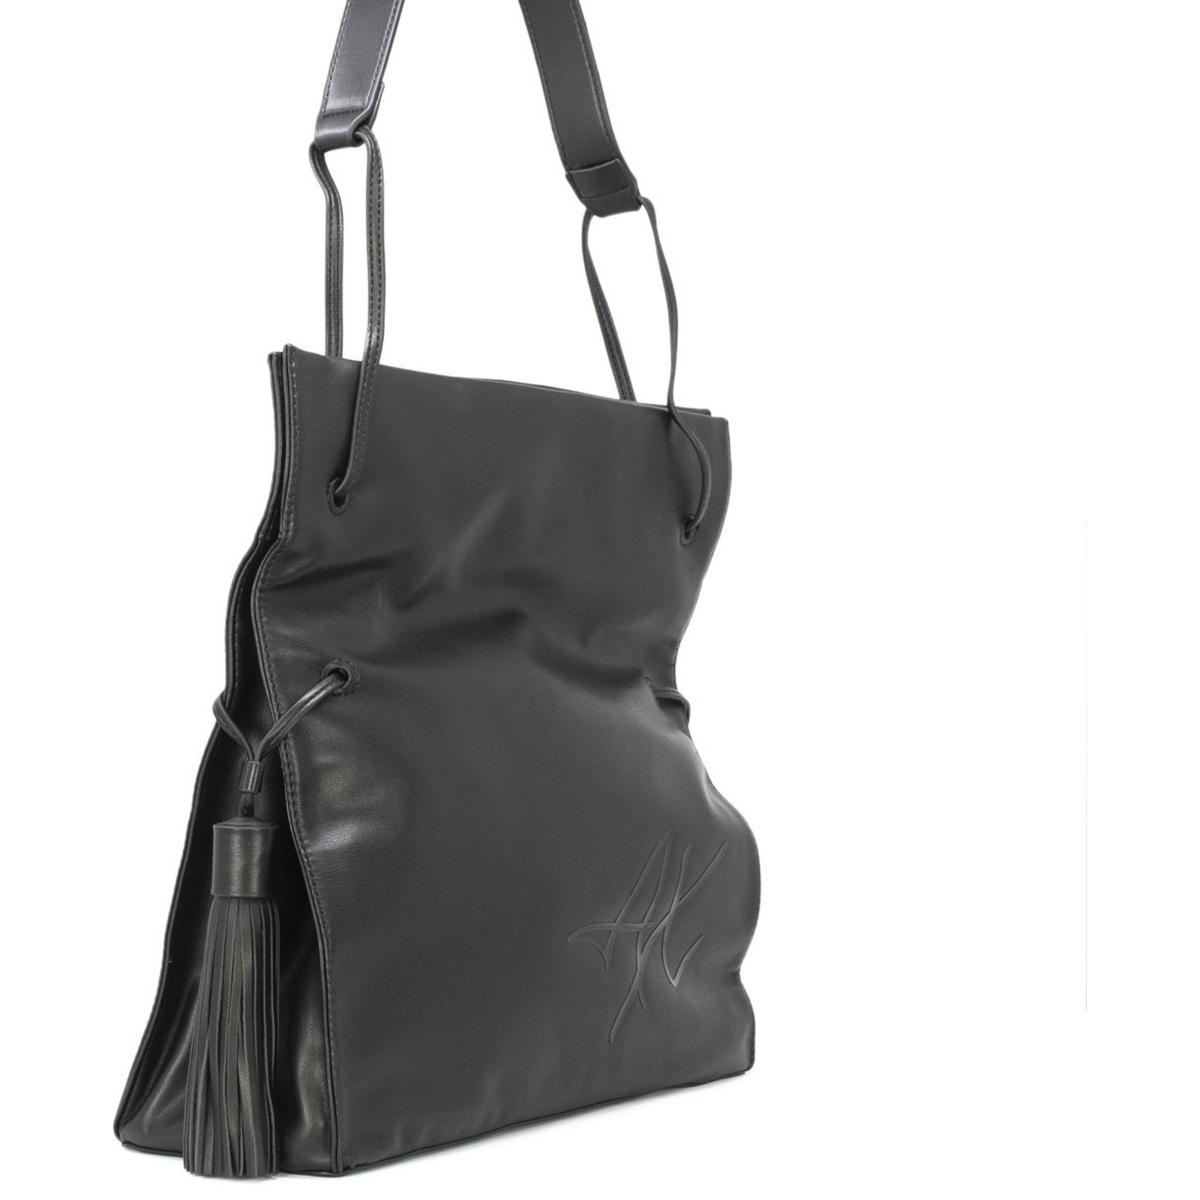 Borsa Armani Exchange Hobo Shoulder Bag da donna rif. 942466 8A219